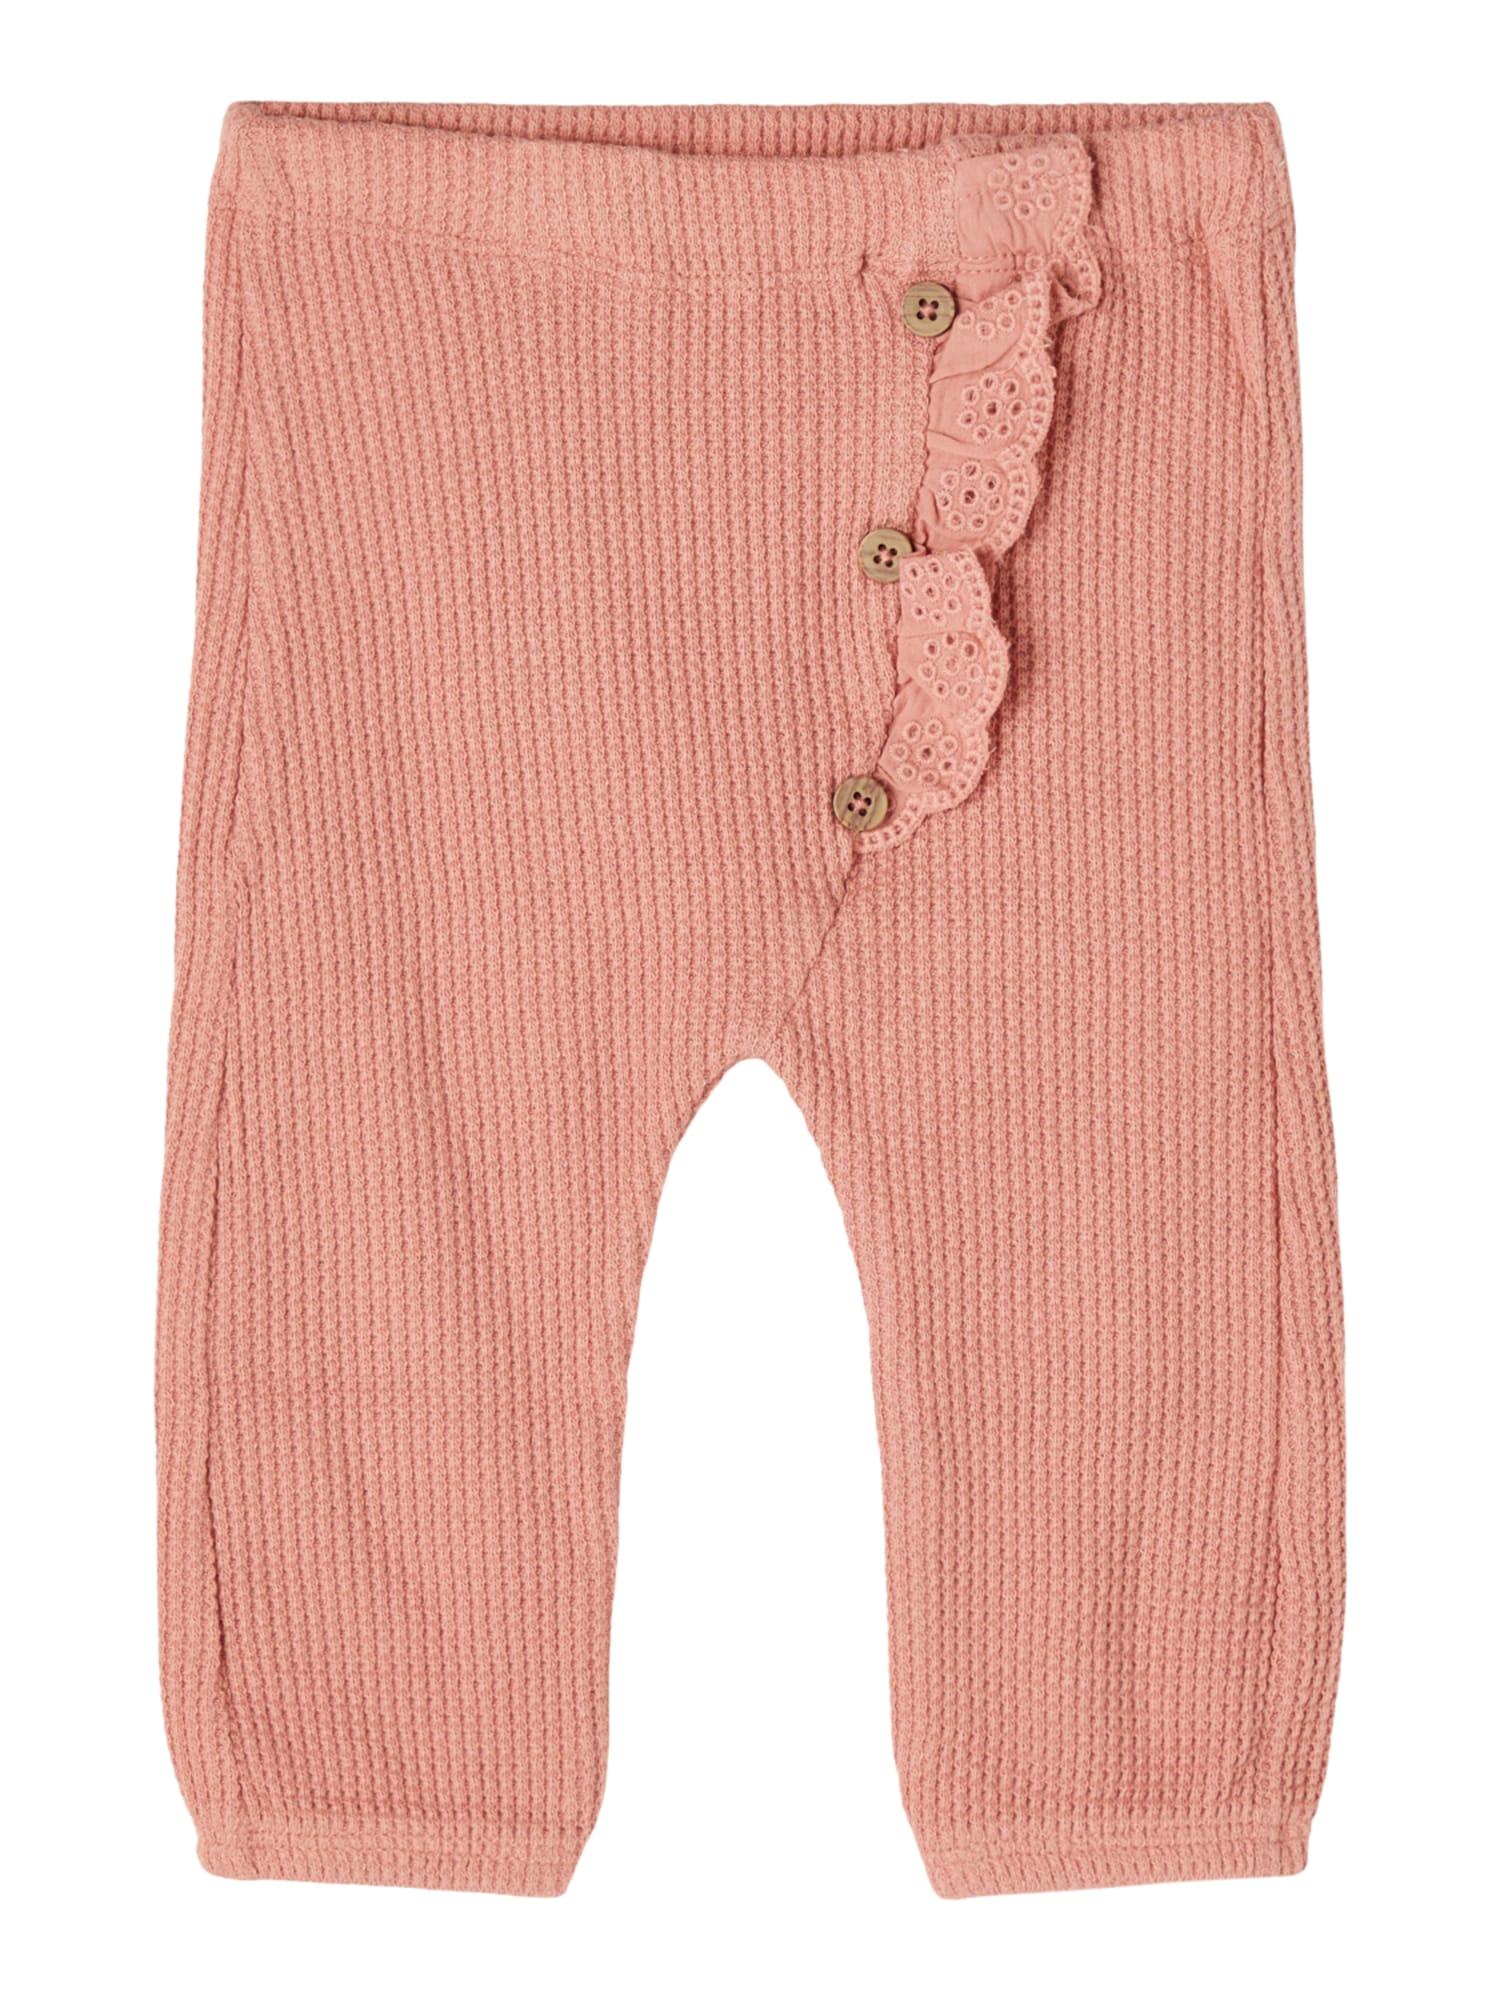 NAME IT Kelnės 'Hannen' rožinė